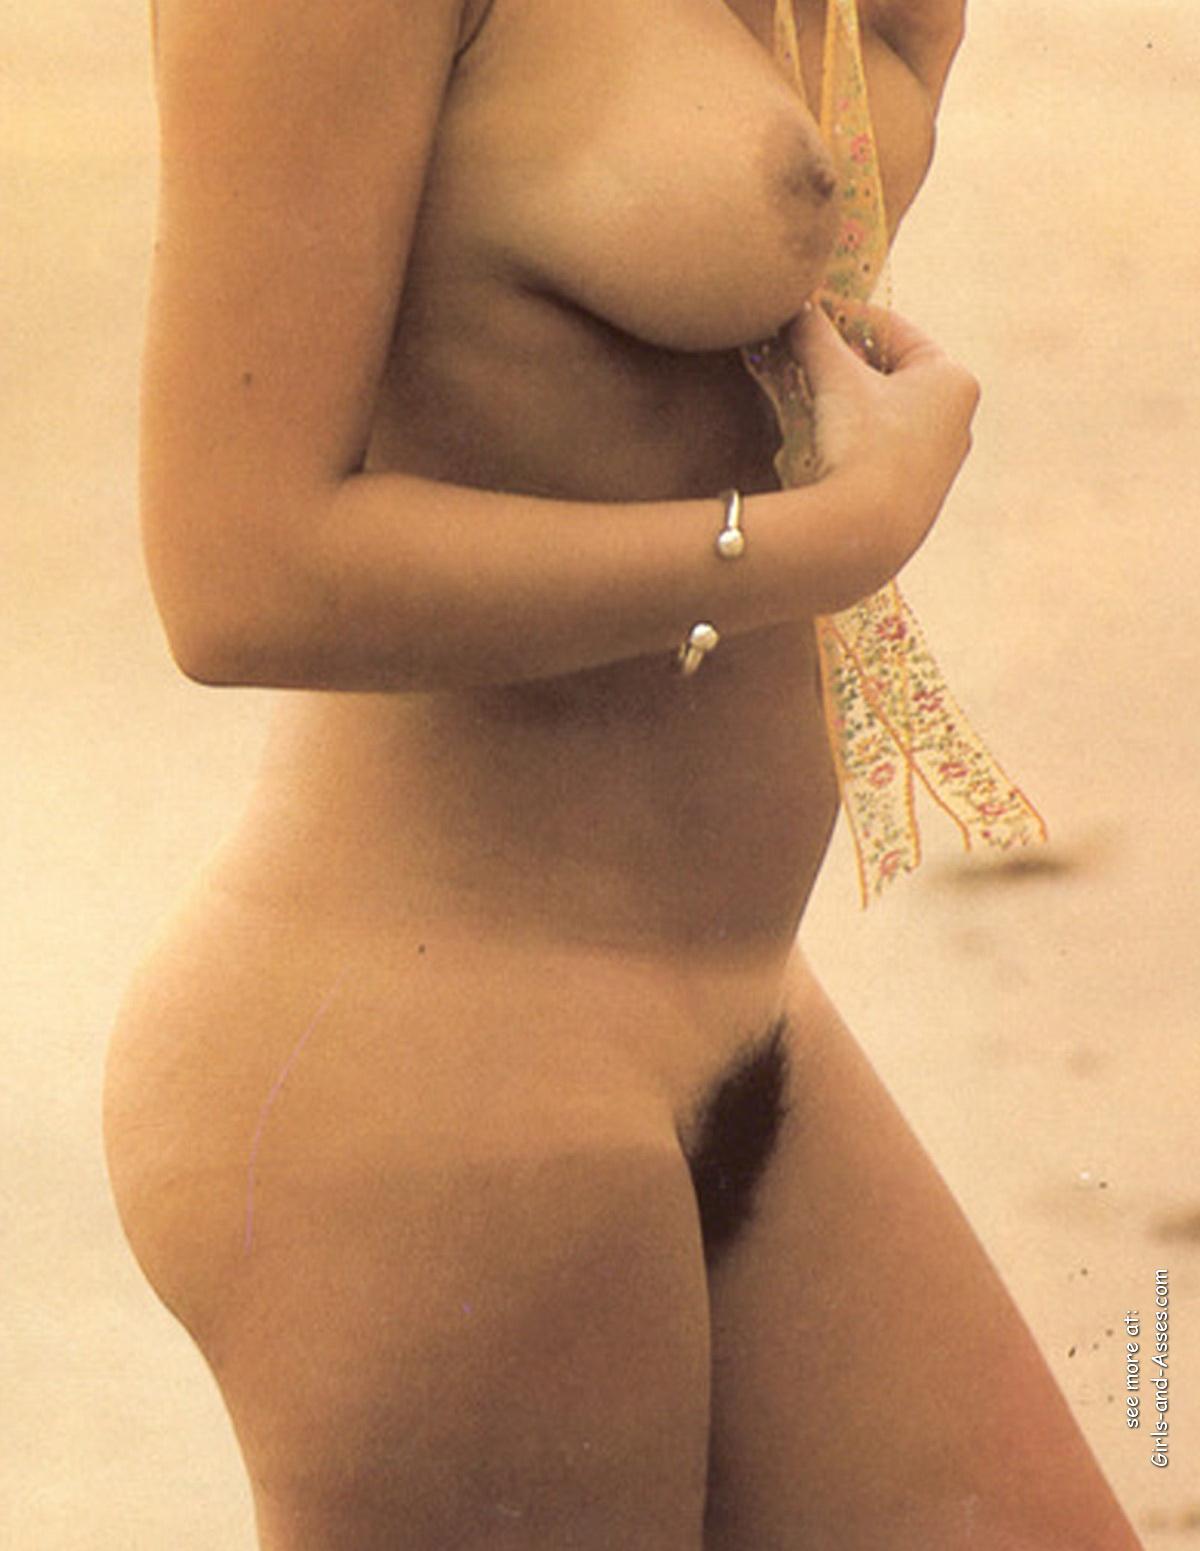 amatuer nude girl at the beach photography 00422